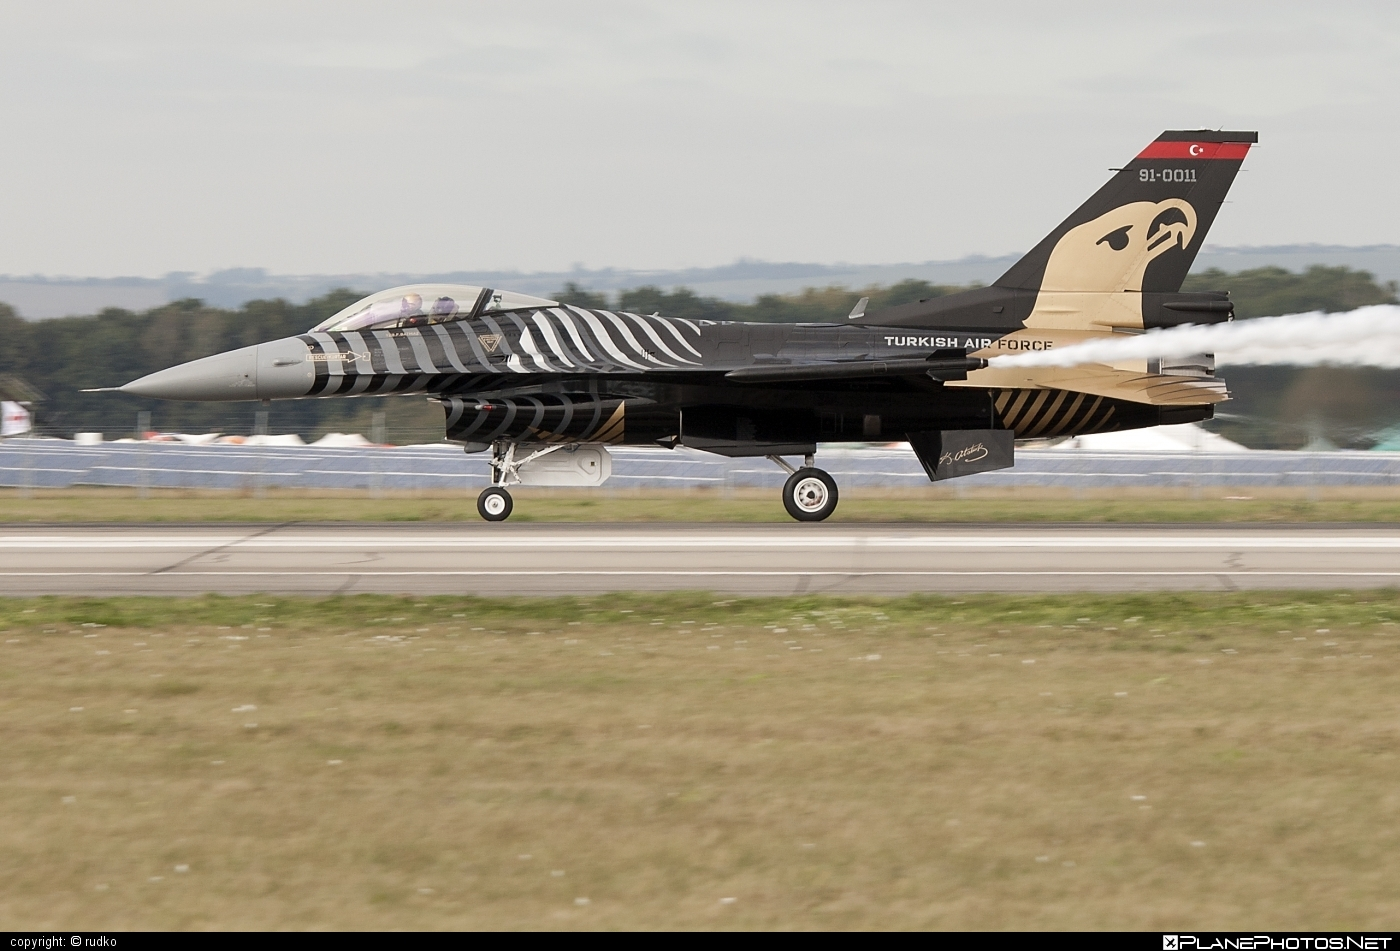 General Dynamics F-16C Fighting Falcon - 91-0011 operated by Türk Hava Kuvvetleri (Turkish Air Force) #f16 #f16c #fightingfalcon #generaldynamics #natodays #natodays2012 #turkishairforce